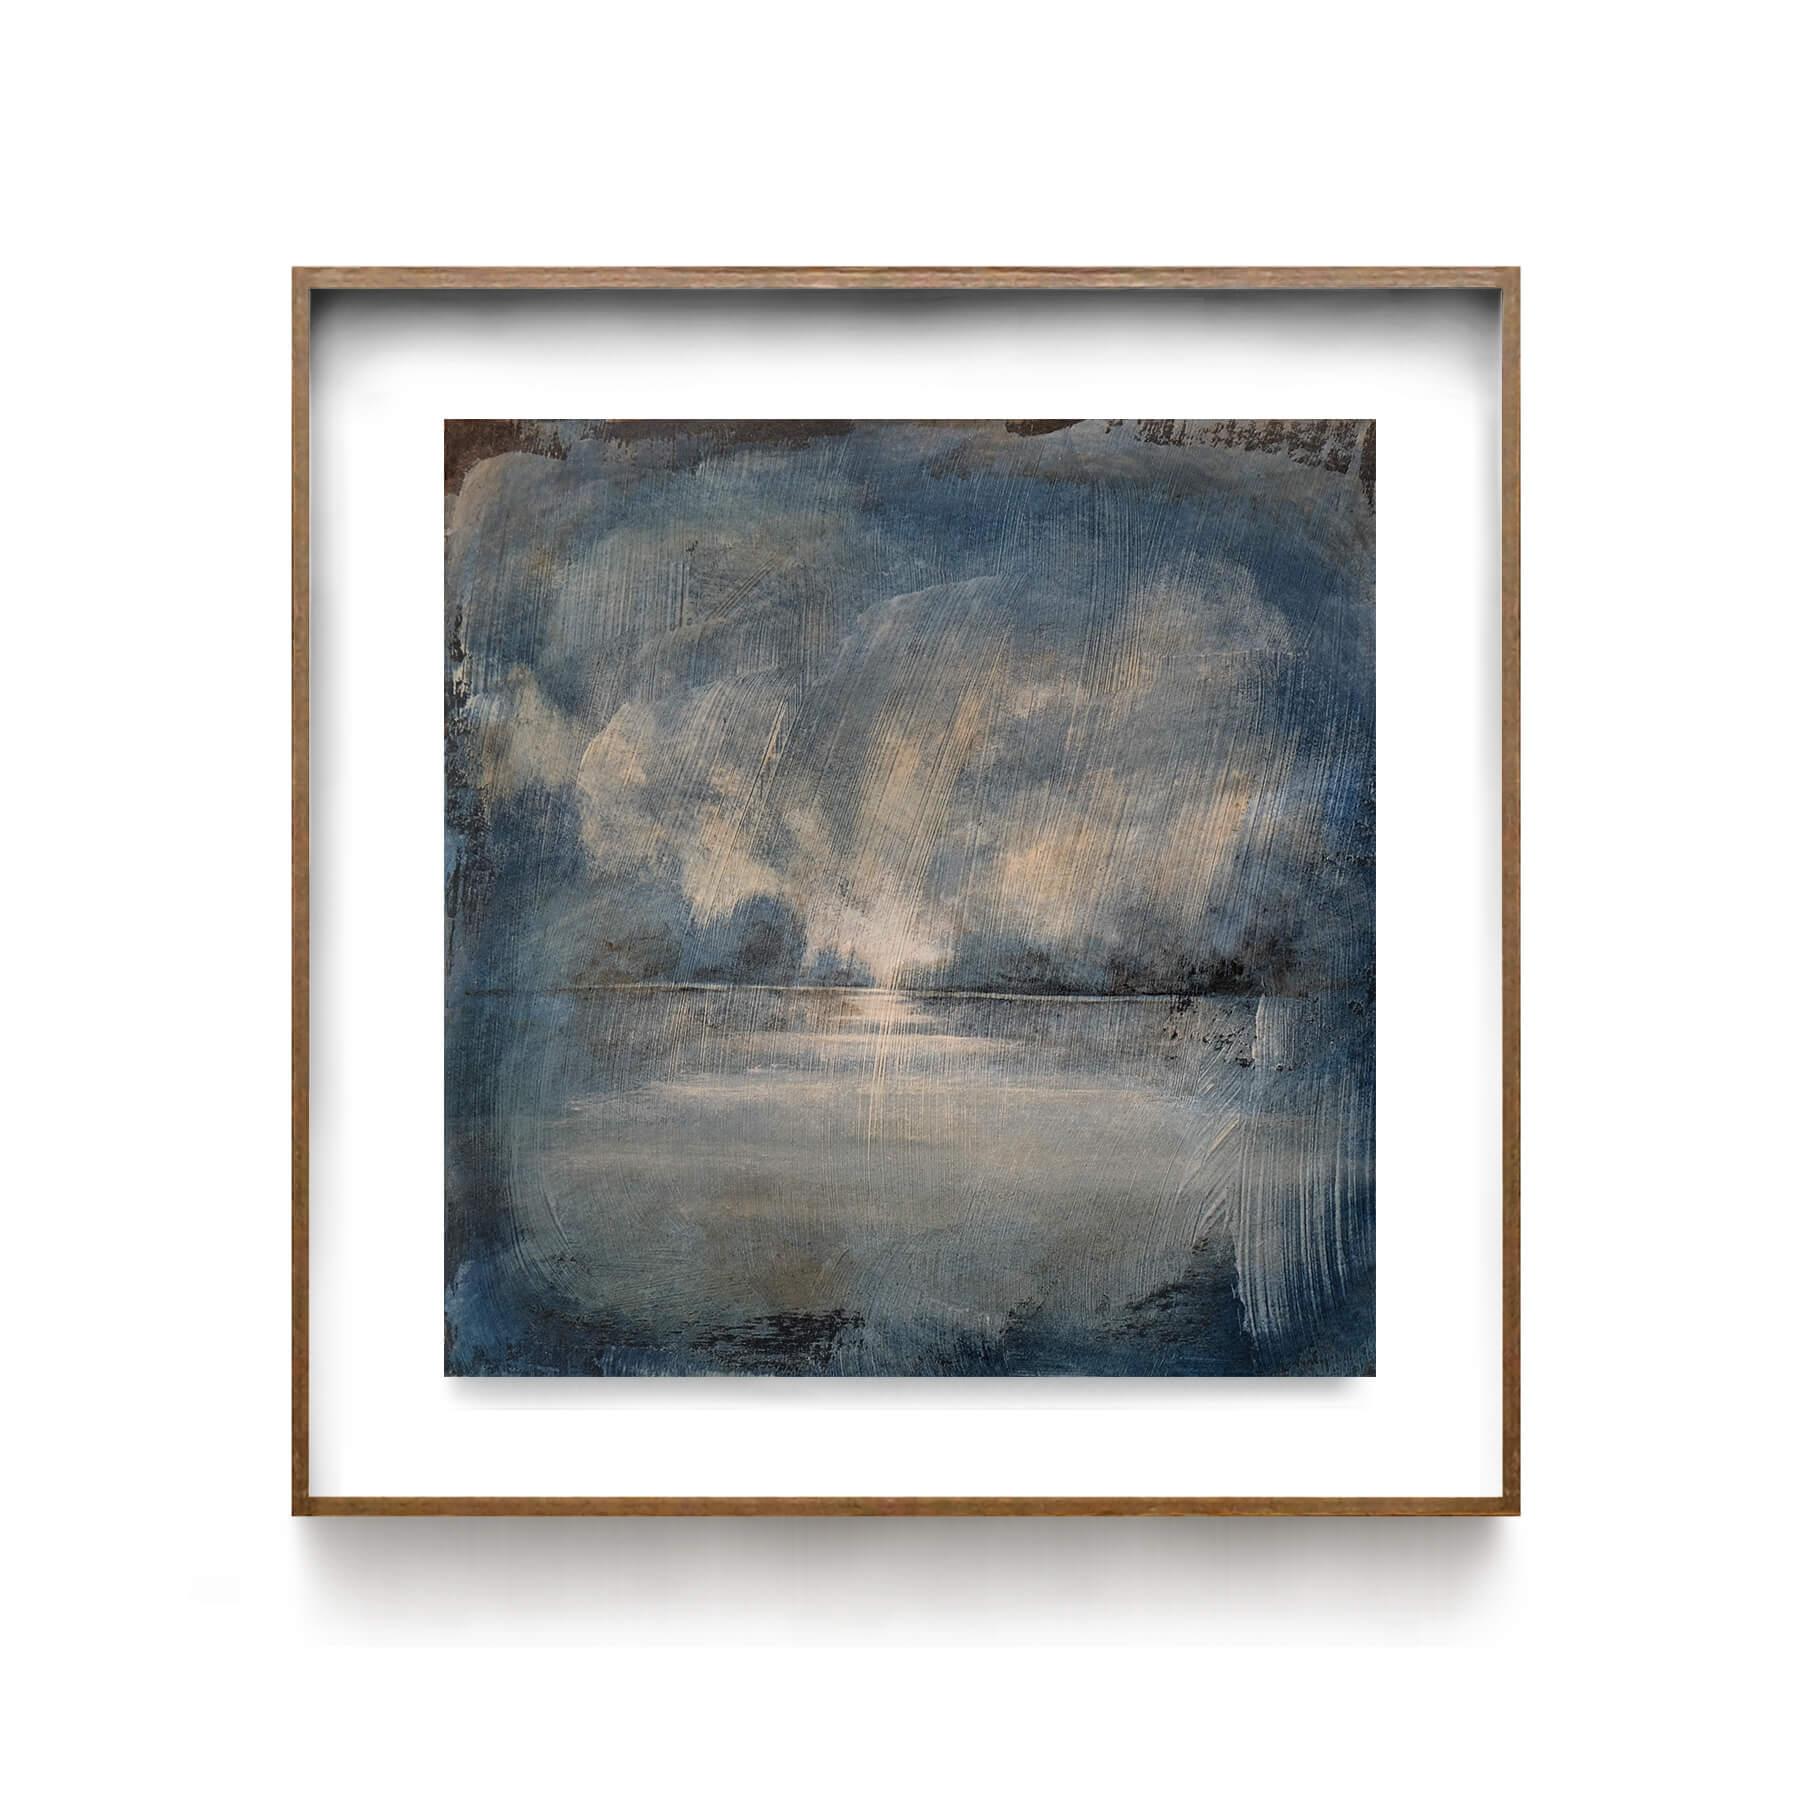 paysage_brume_gris_bleu_lightbox